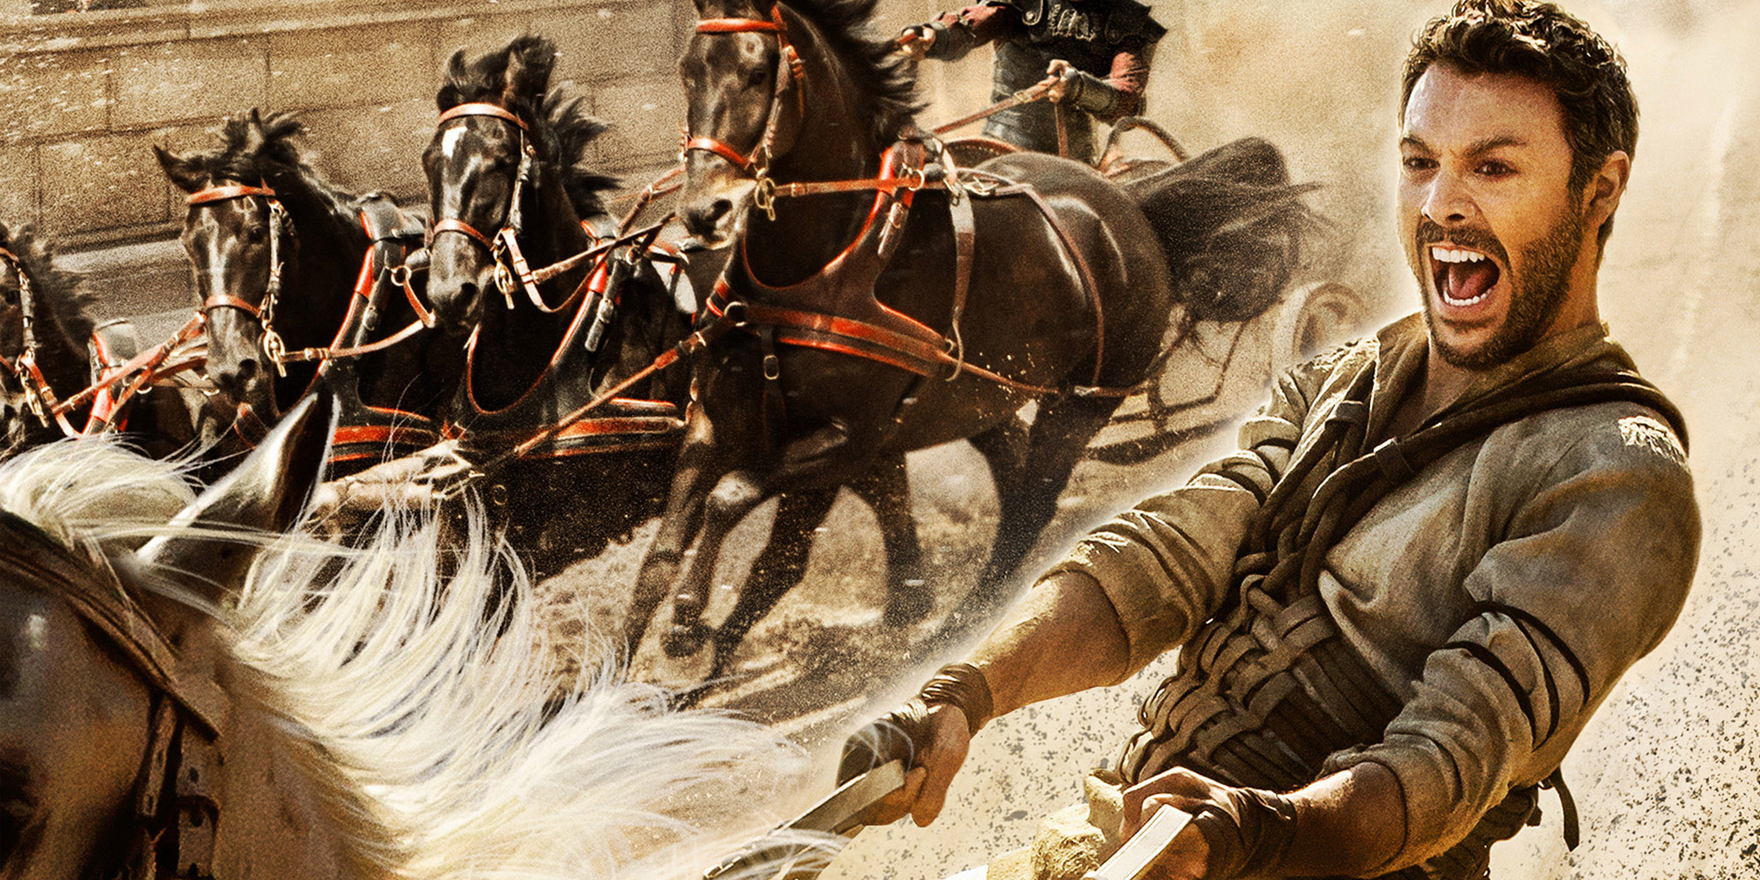 Ben-Hur - Header Image